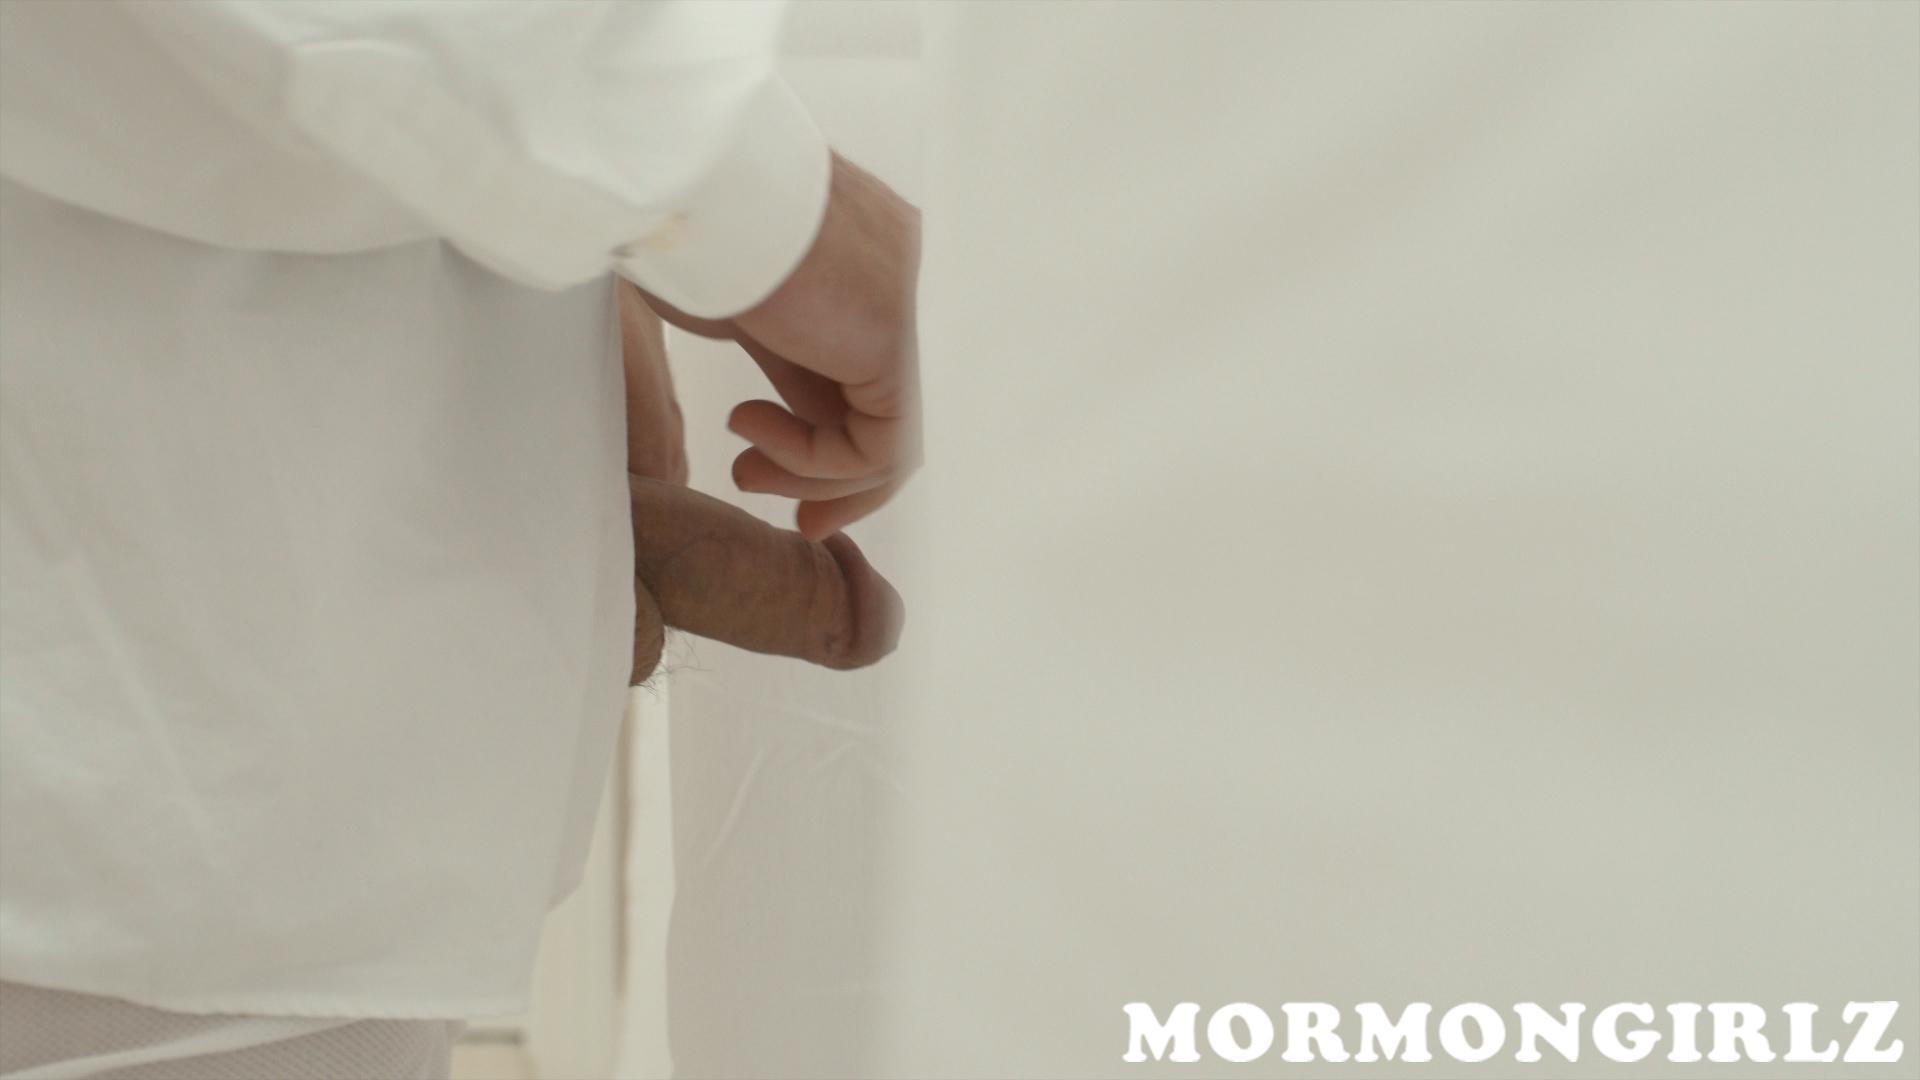 mormongirlz_75_06